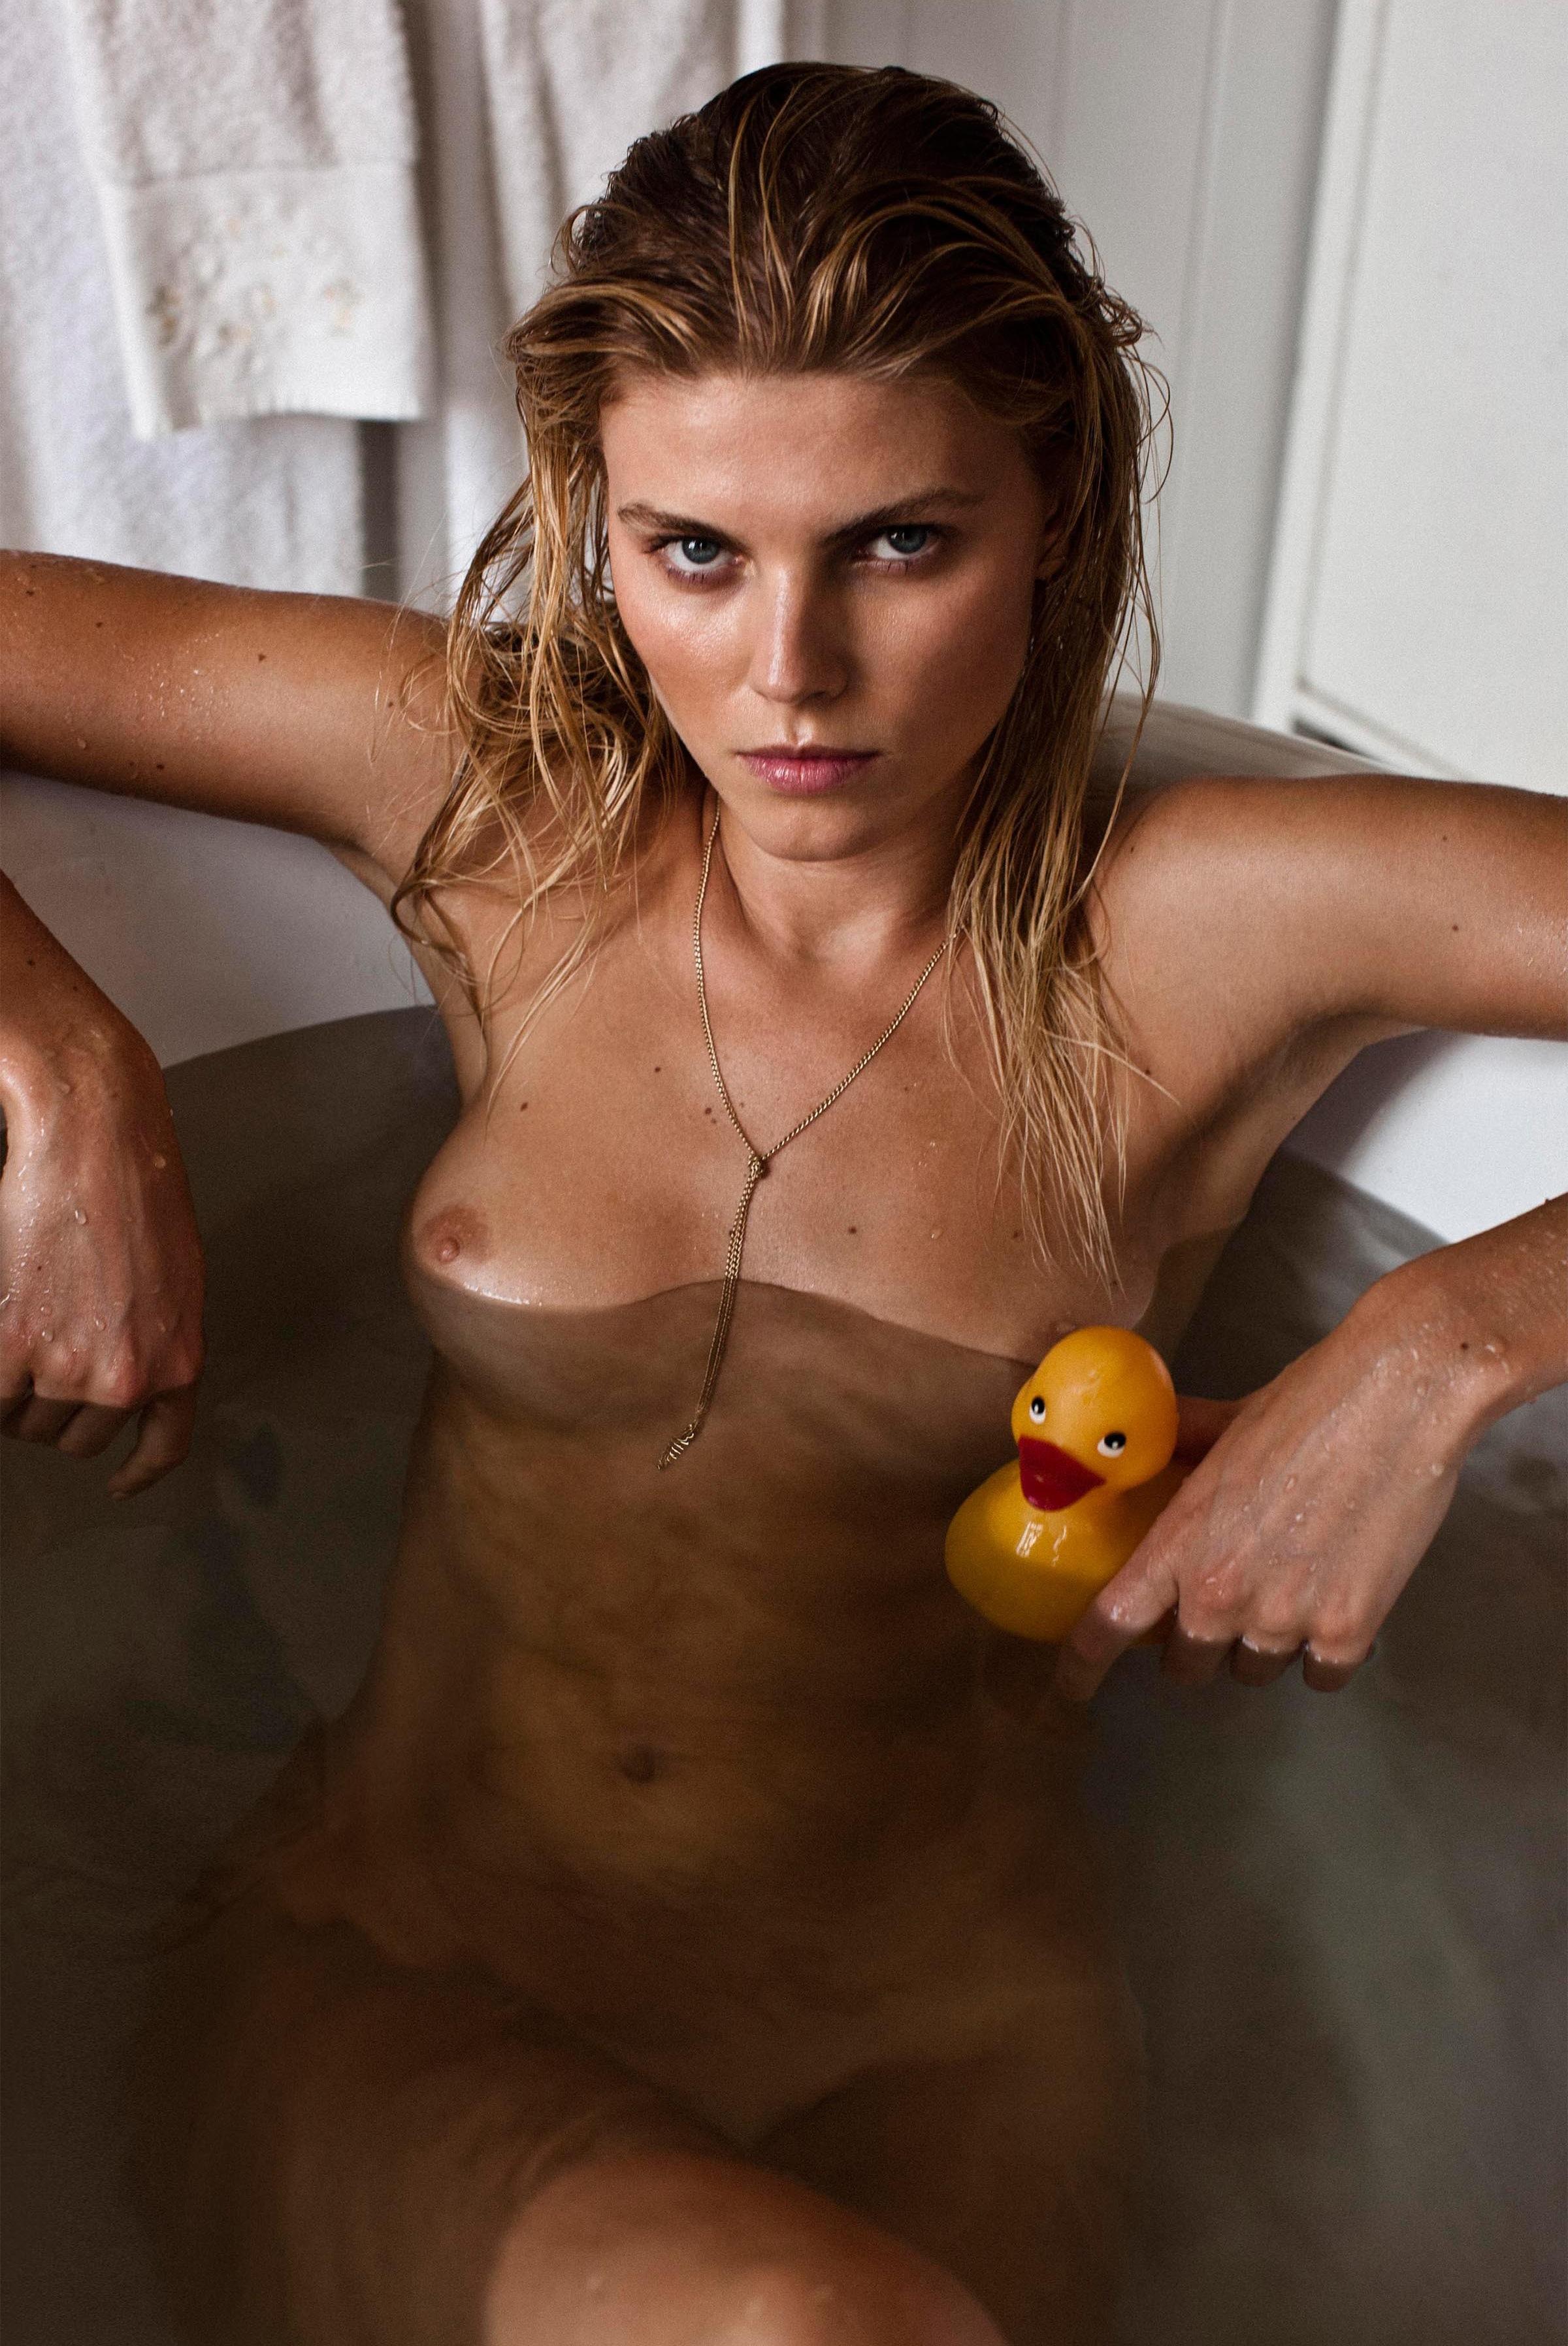 Maryna_Linchuk-Victor_Demarchelier-25_Magazine-01-itr2010.jpeg